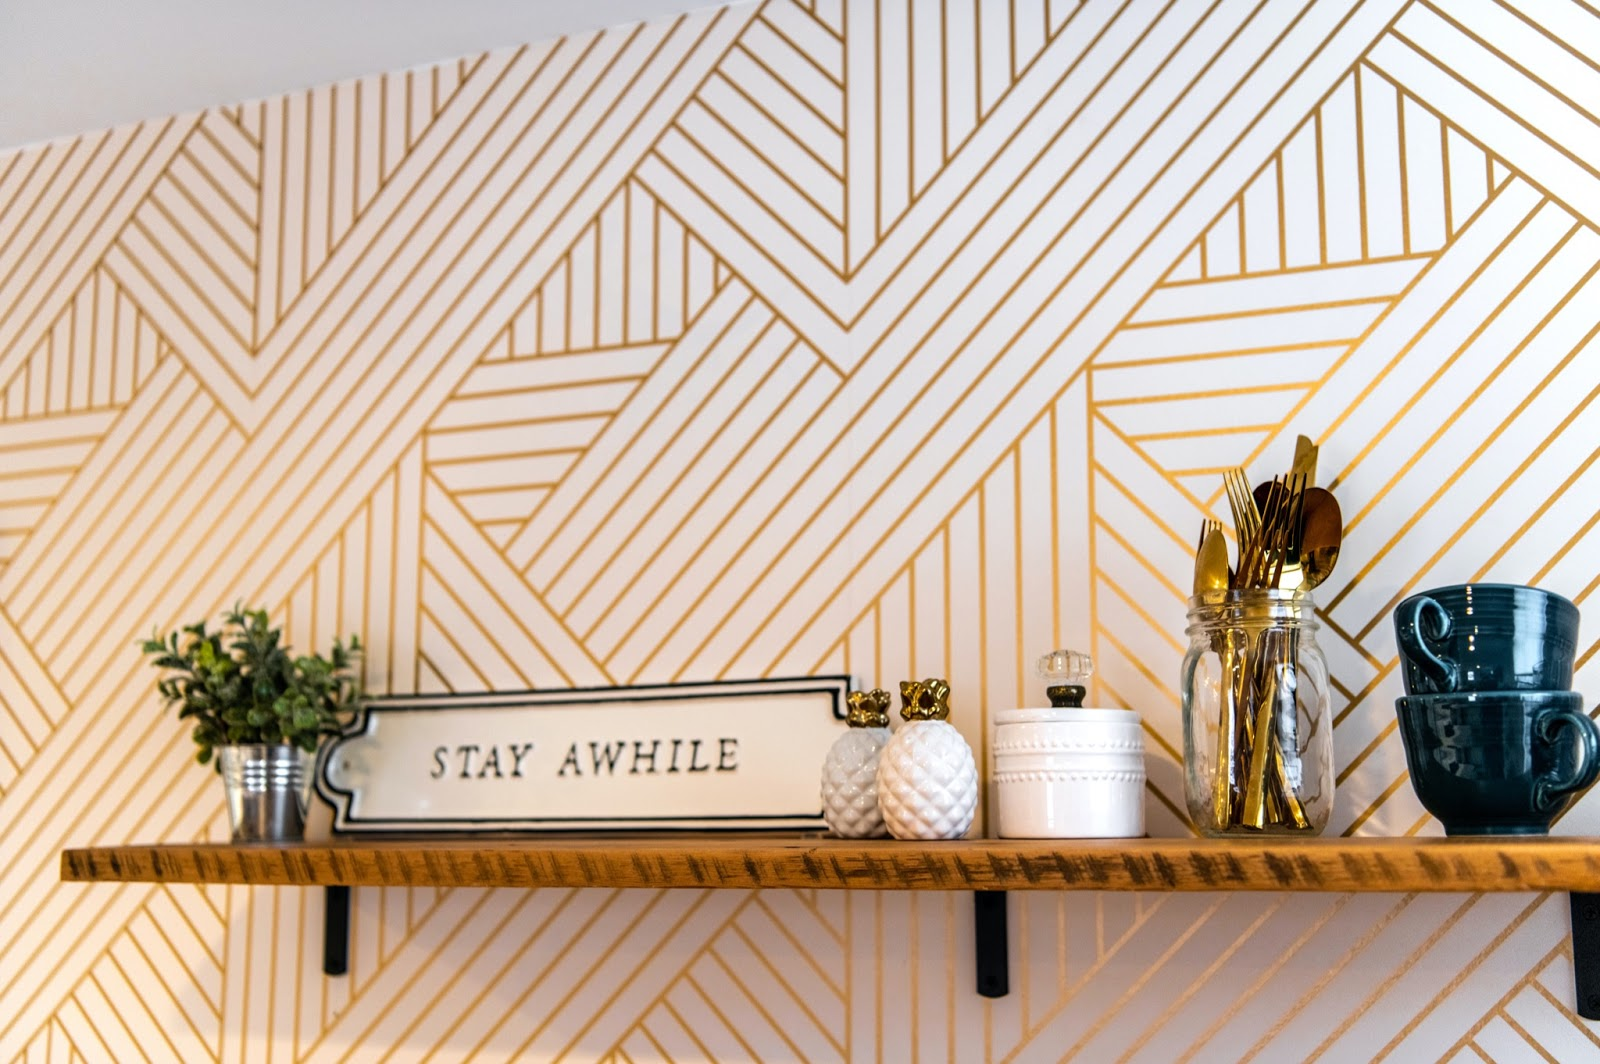 Wall Decor that reads Stay Awake